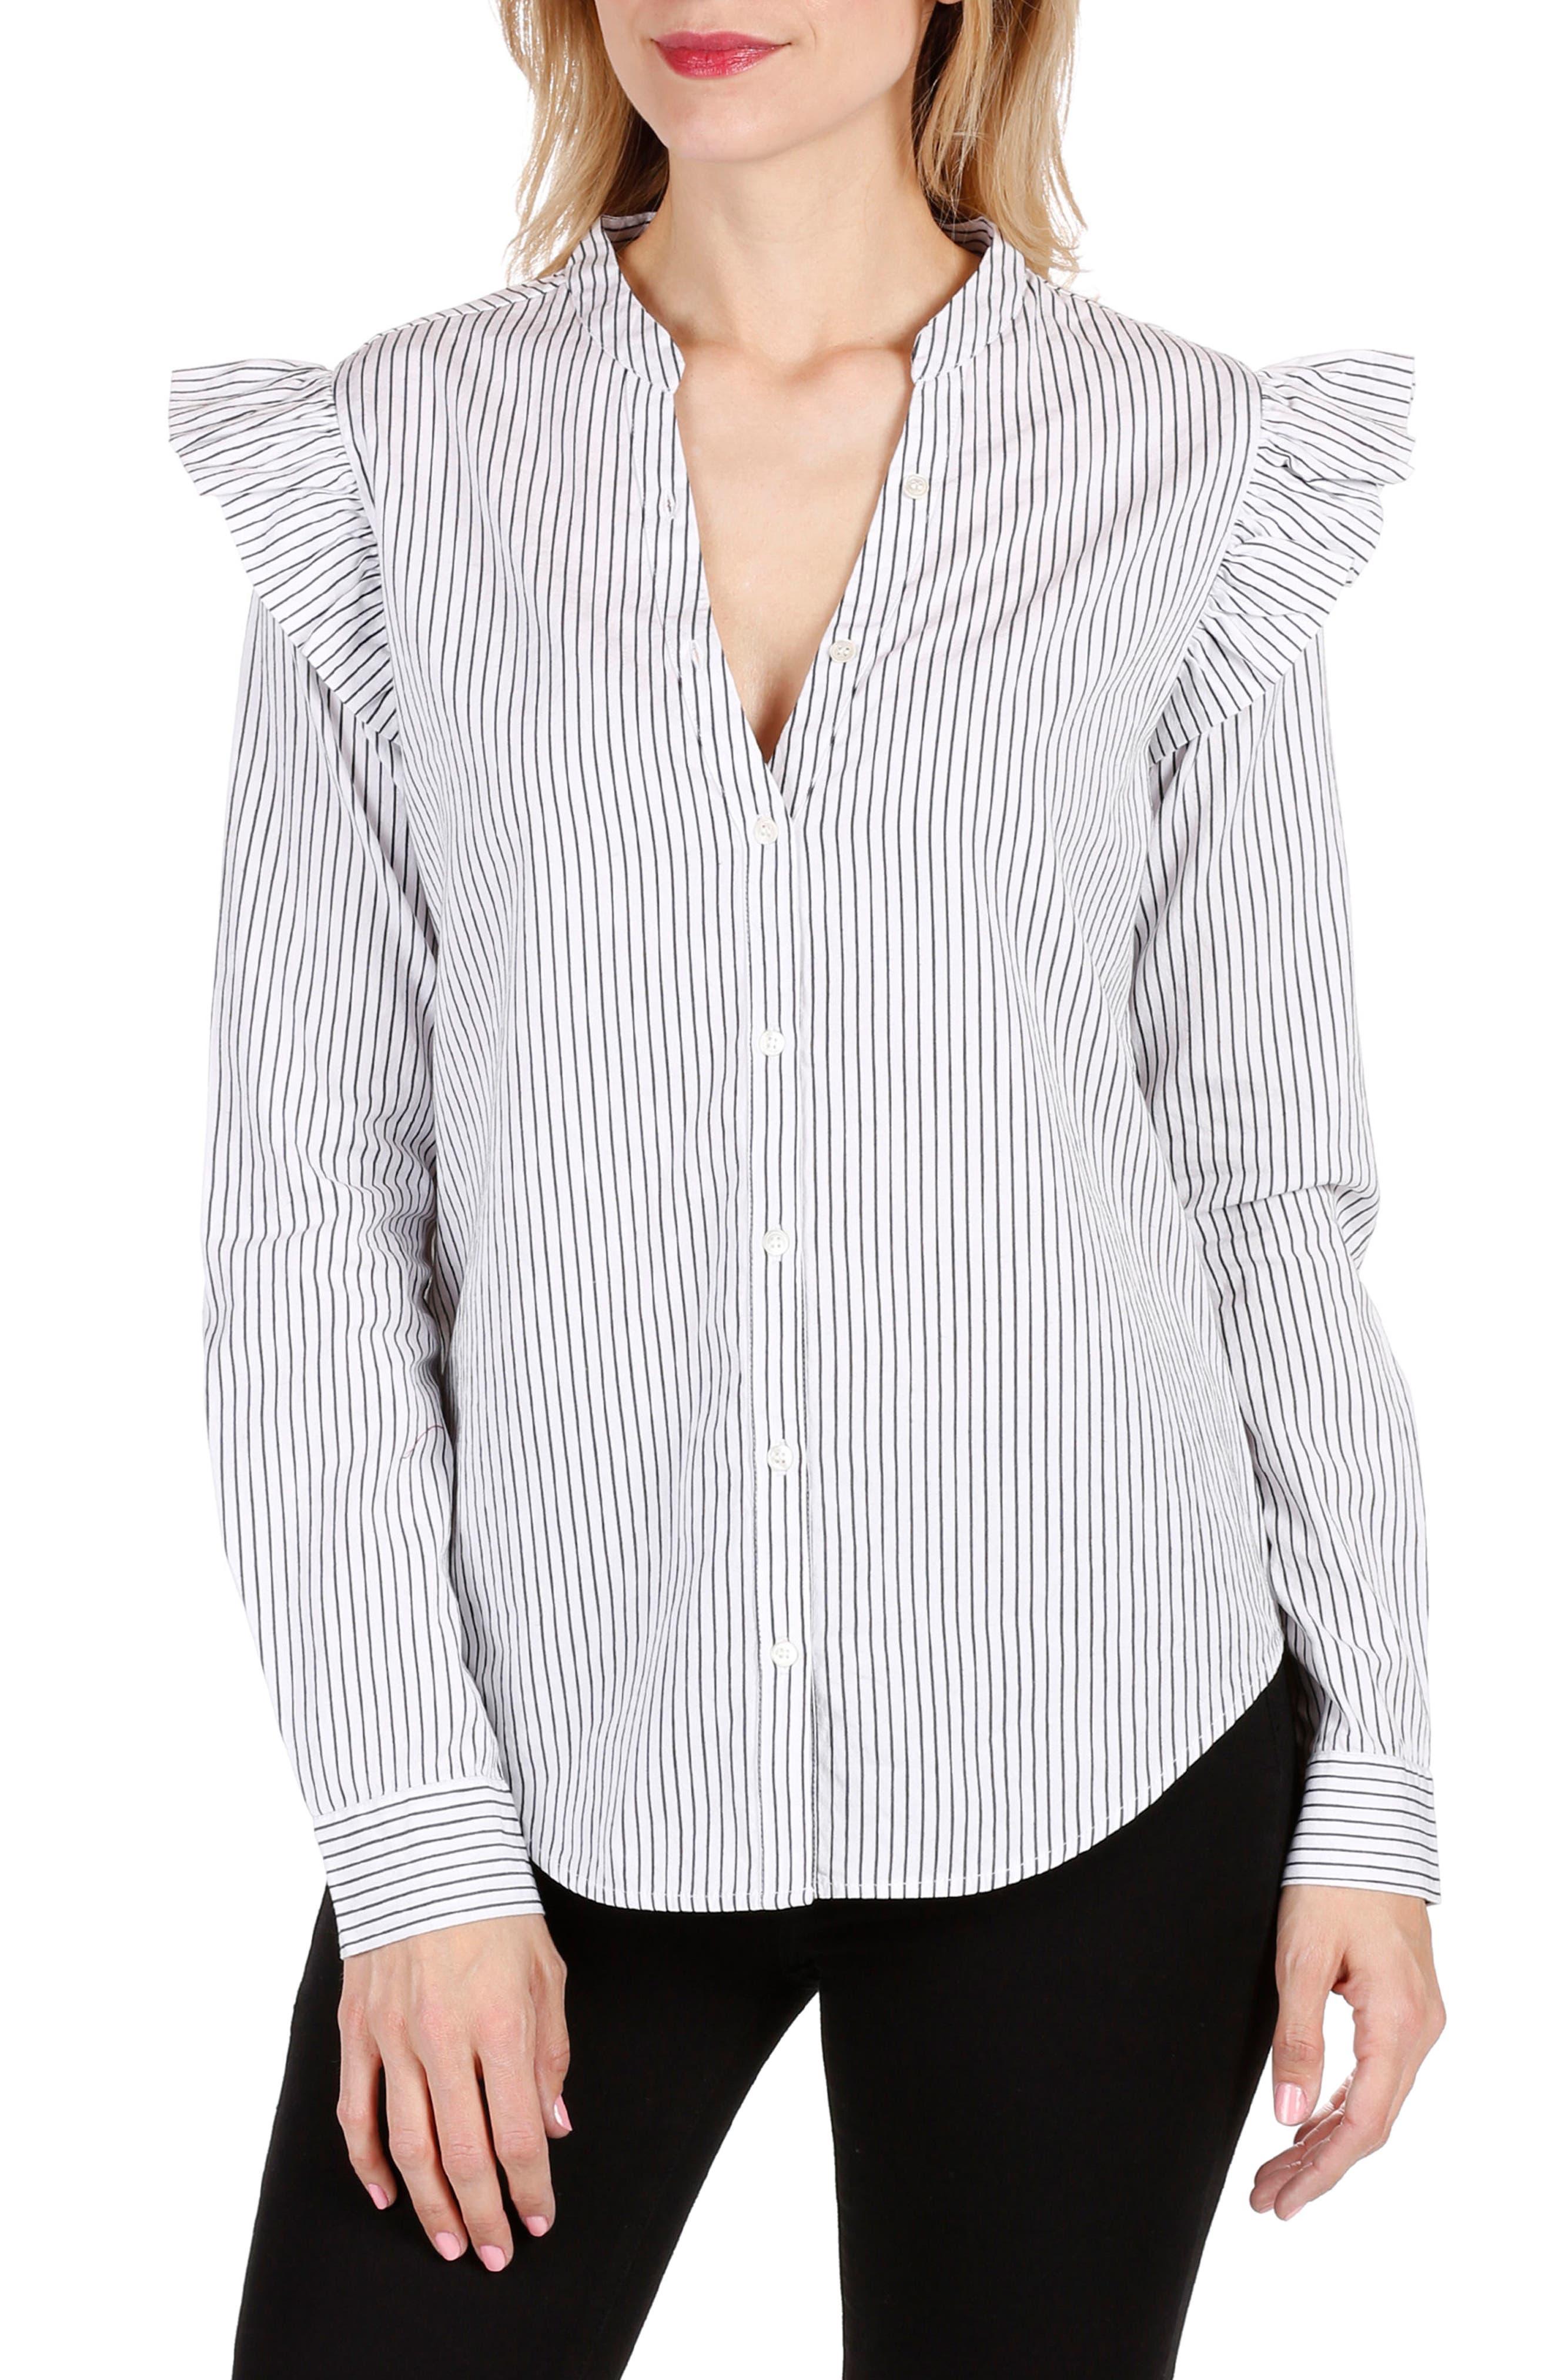 Jenelle Ruffle Dress Shirt,                             Main thumbnail 1, color,                             160